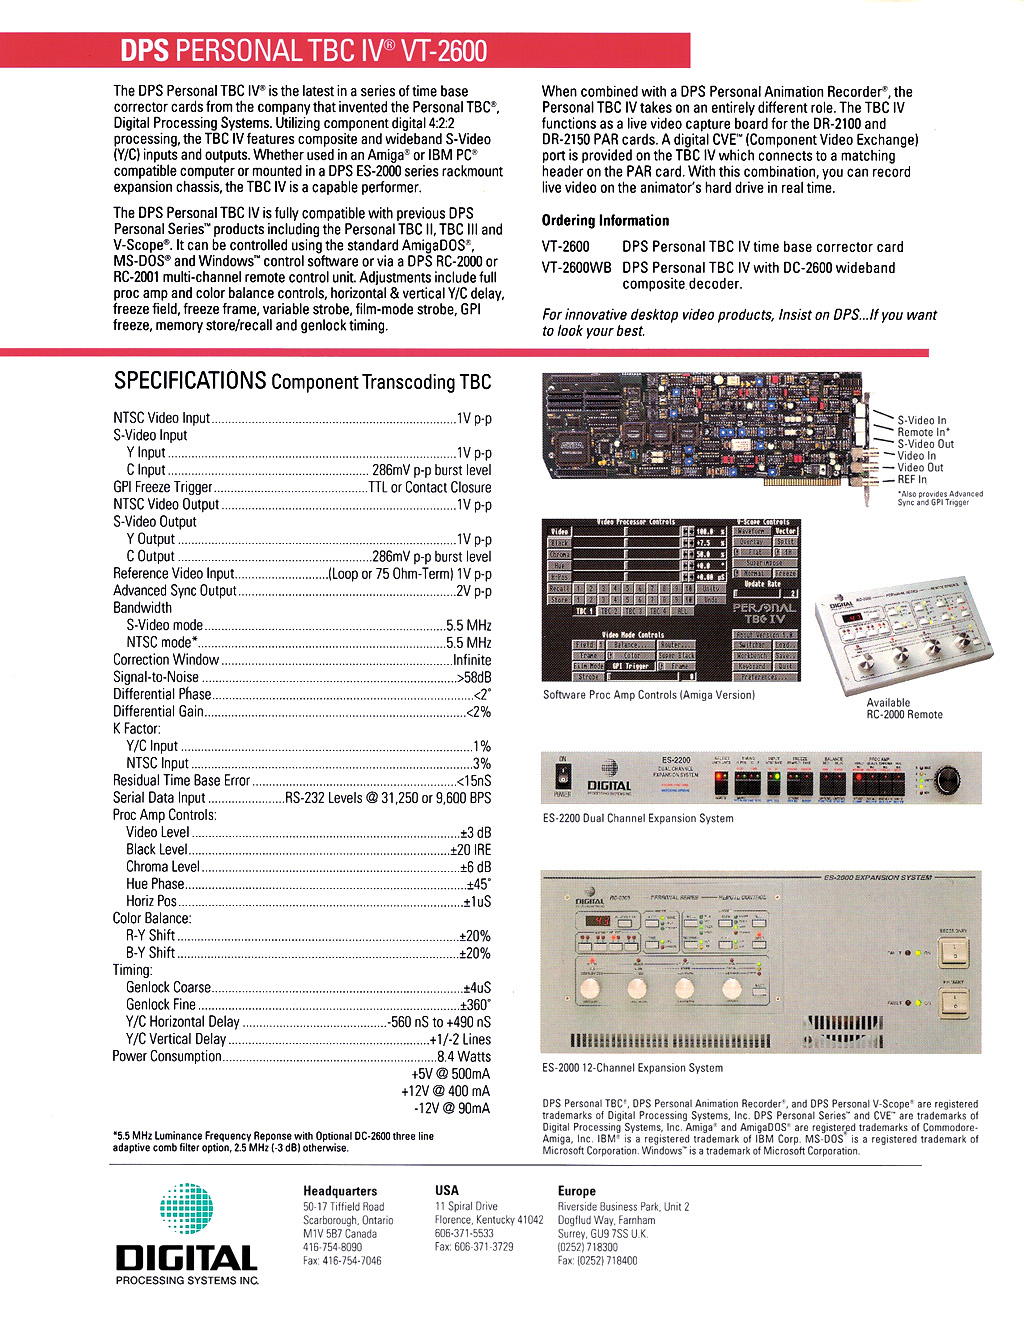 dps tbc iv time base corrector for amiga 2000 3000 t 4000. Black Bedroom Furniture Sets. Home Design Ideas